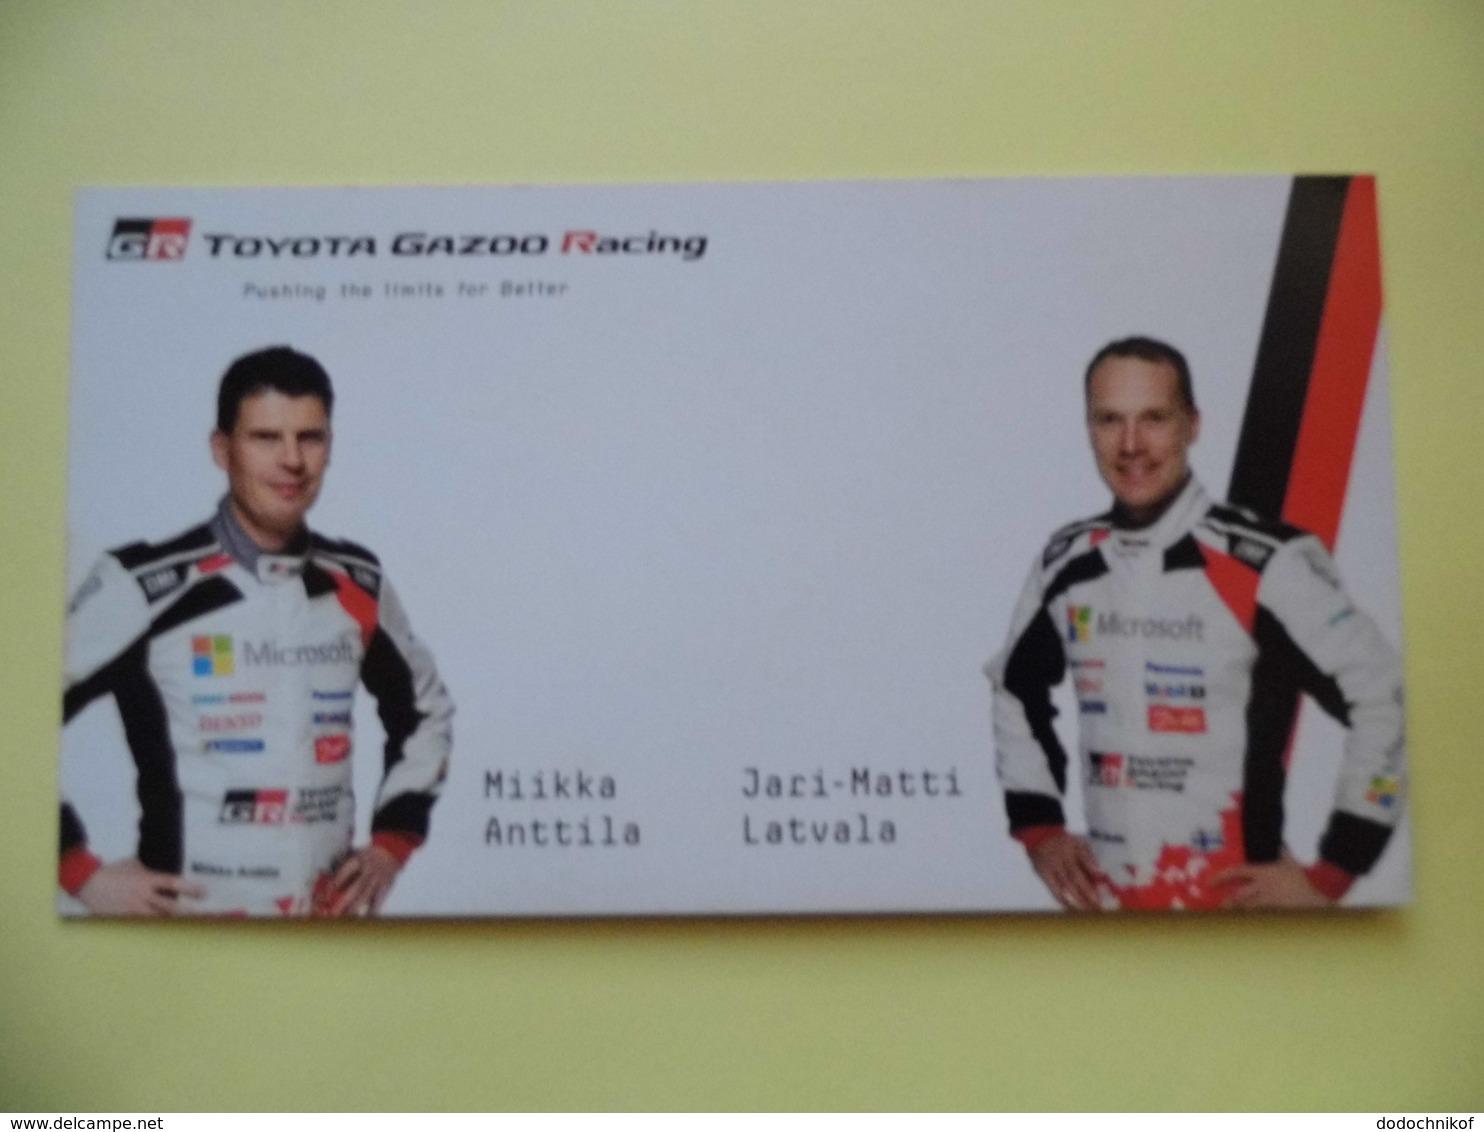 WRC - Carte  -  Team Toyota Gazoo Racing - Latvala- Anttila  - Dim 20* 10.5 Cm - Automobile - F1